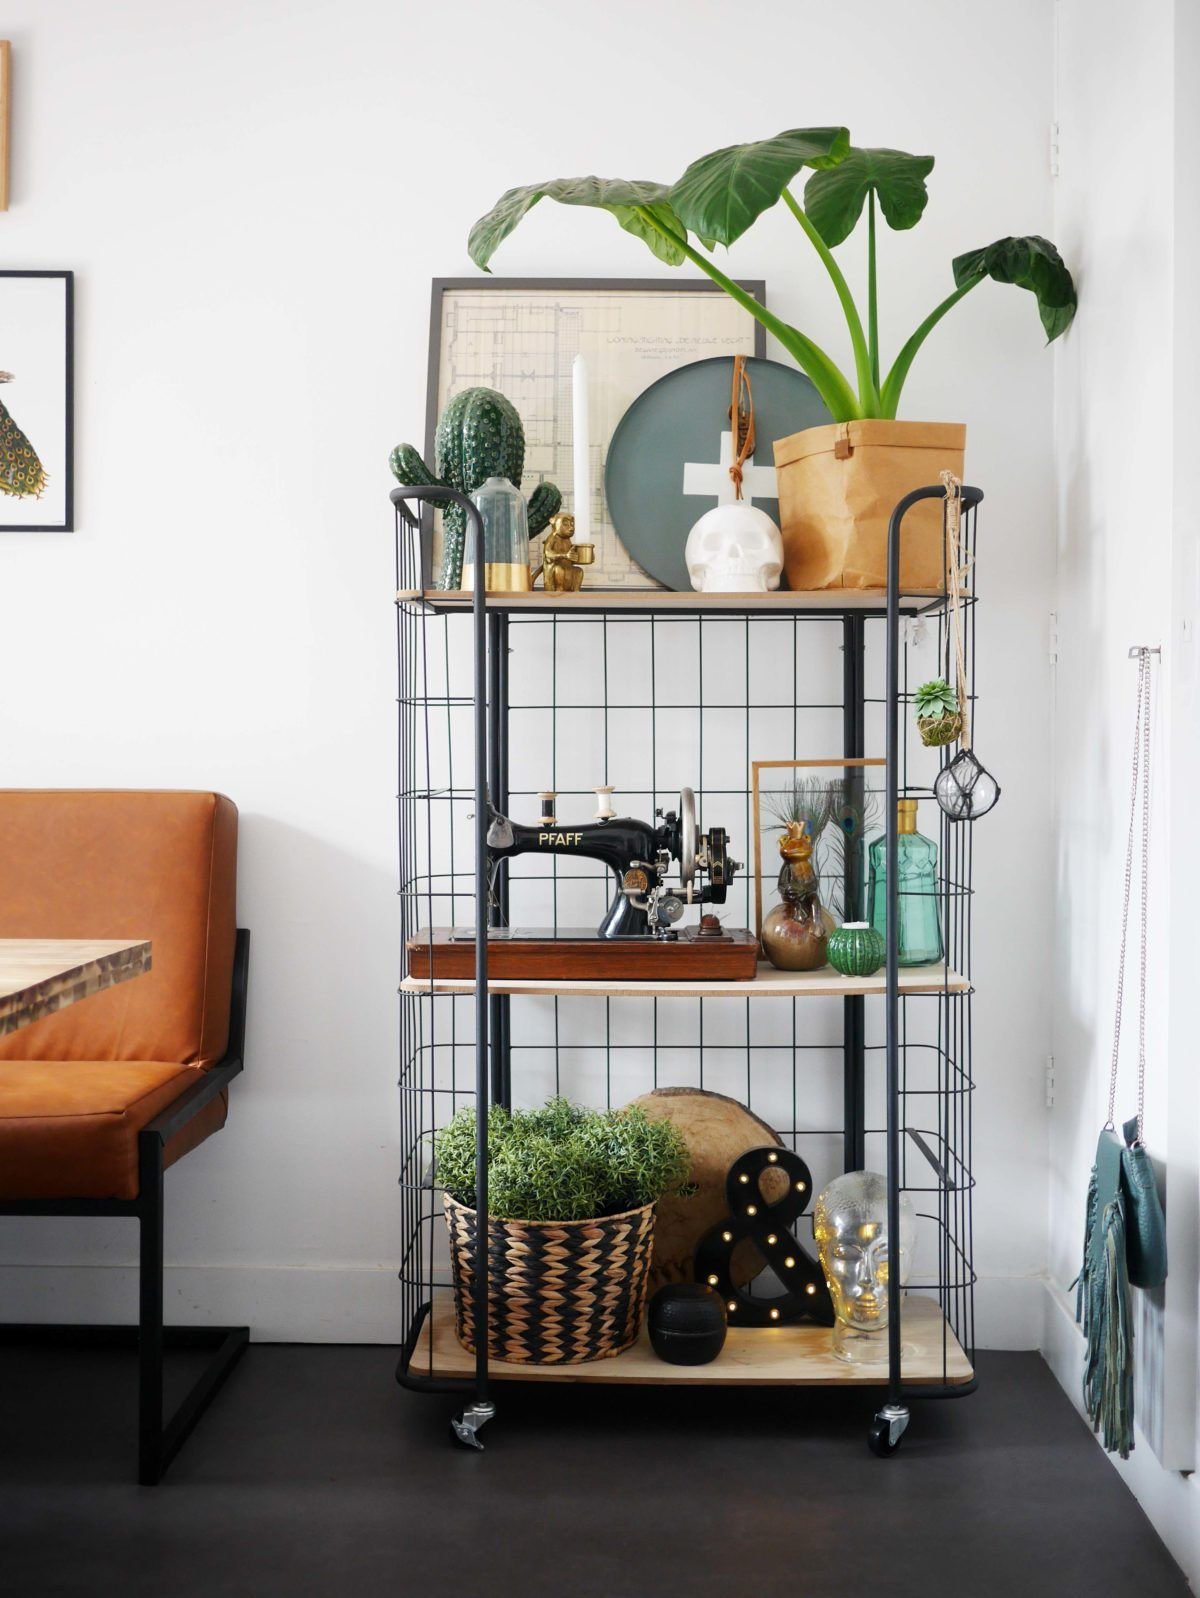 bakkerkast woonkamer keuken inspiratie ideeën decoratie | Cynthia.nl ...